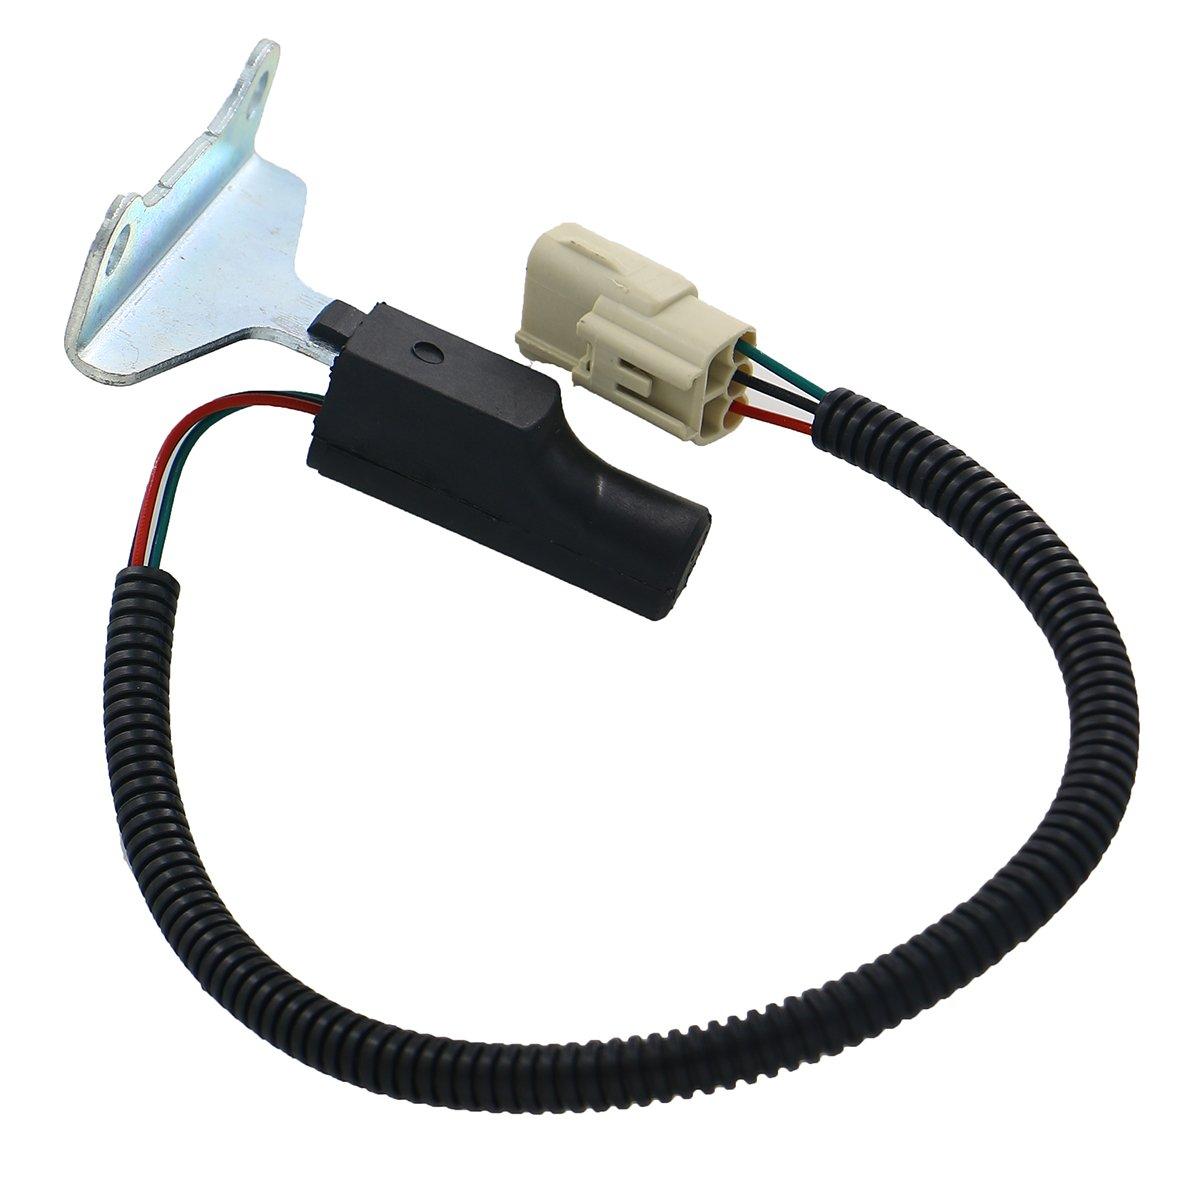 MUCO New Crankshaft Crank Angle Position Sensor For Dodge Ram Manual Transmission PC128 56027871 SU3067